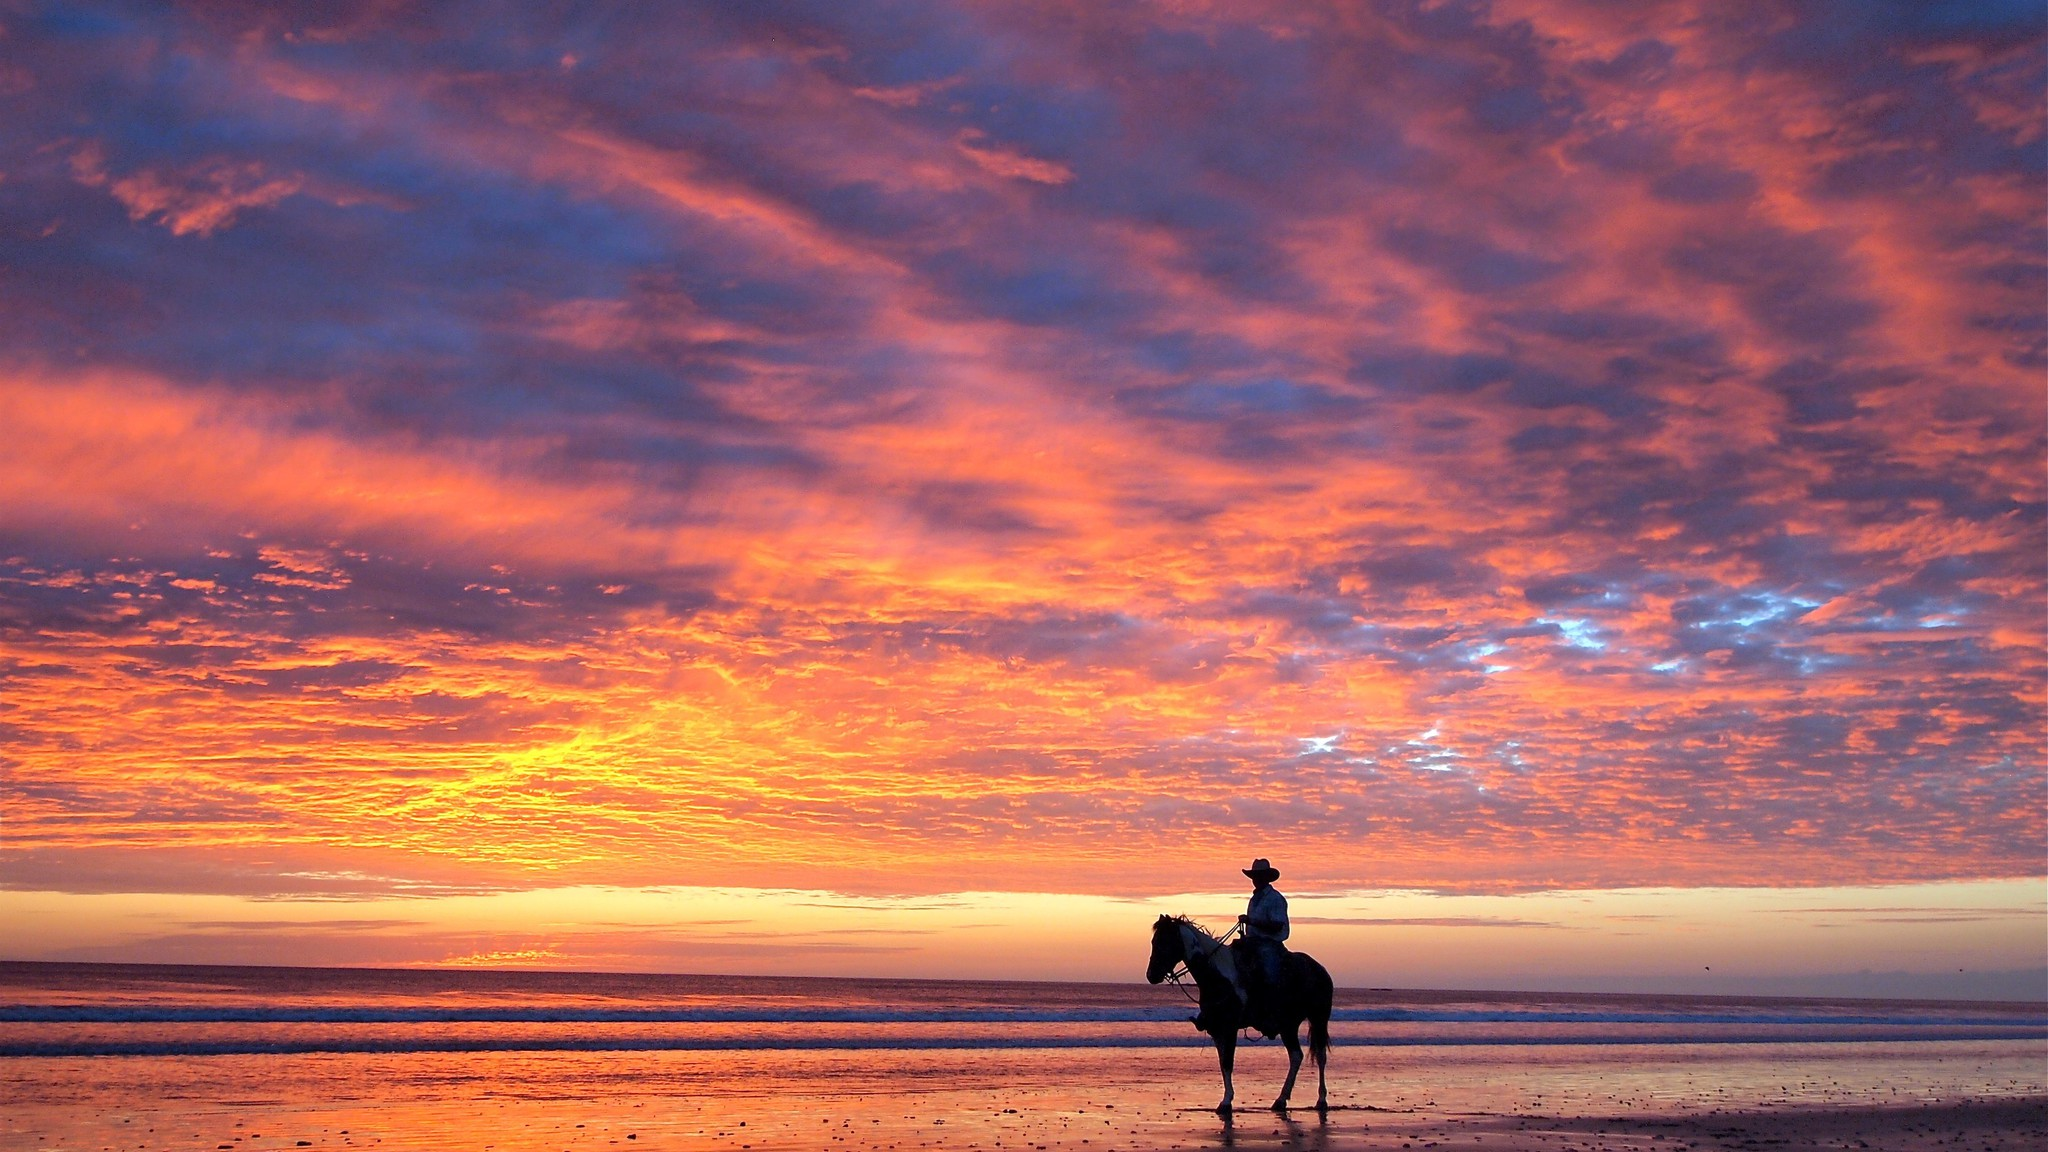 ковбой при закате